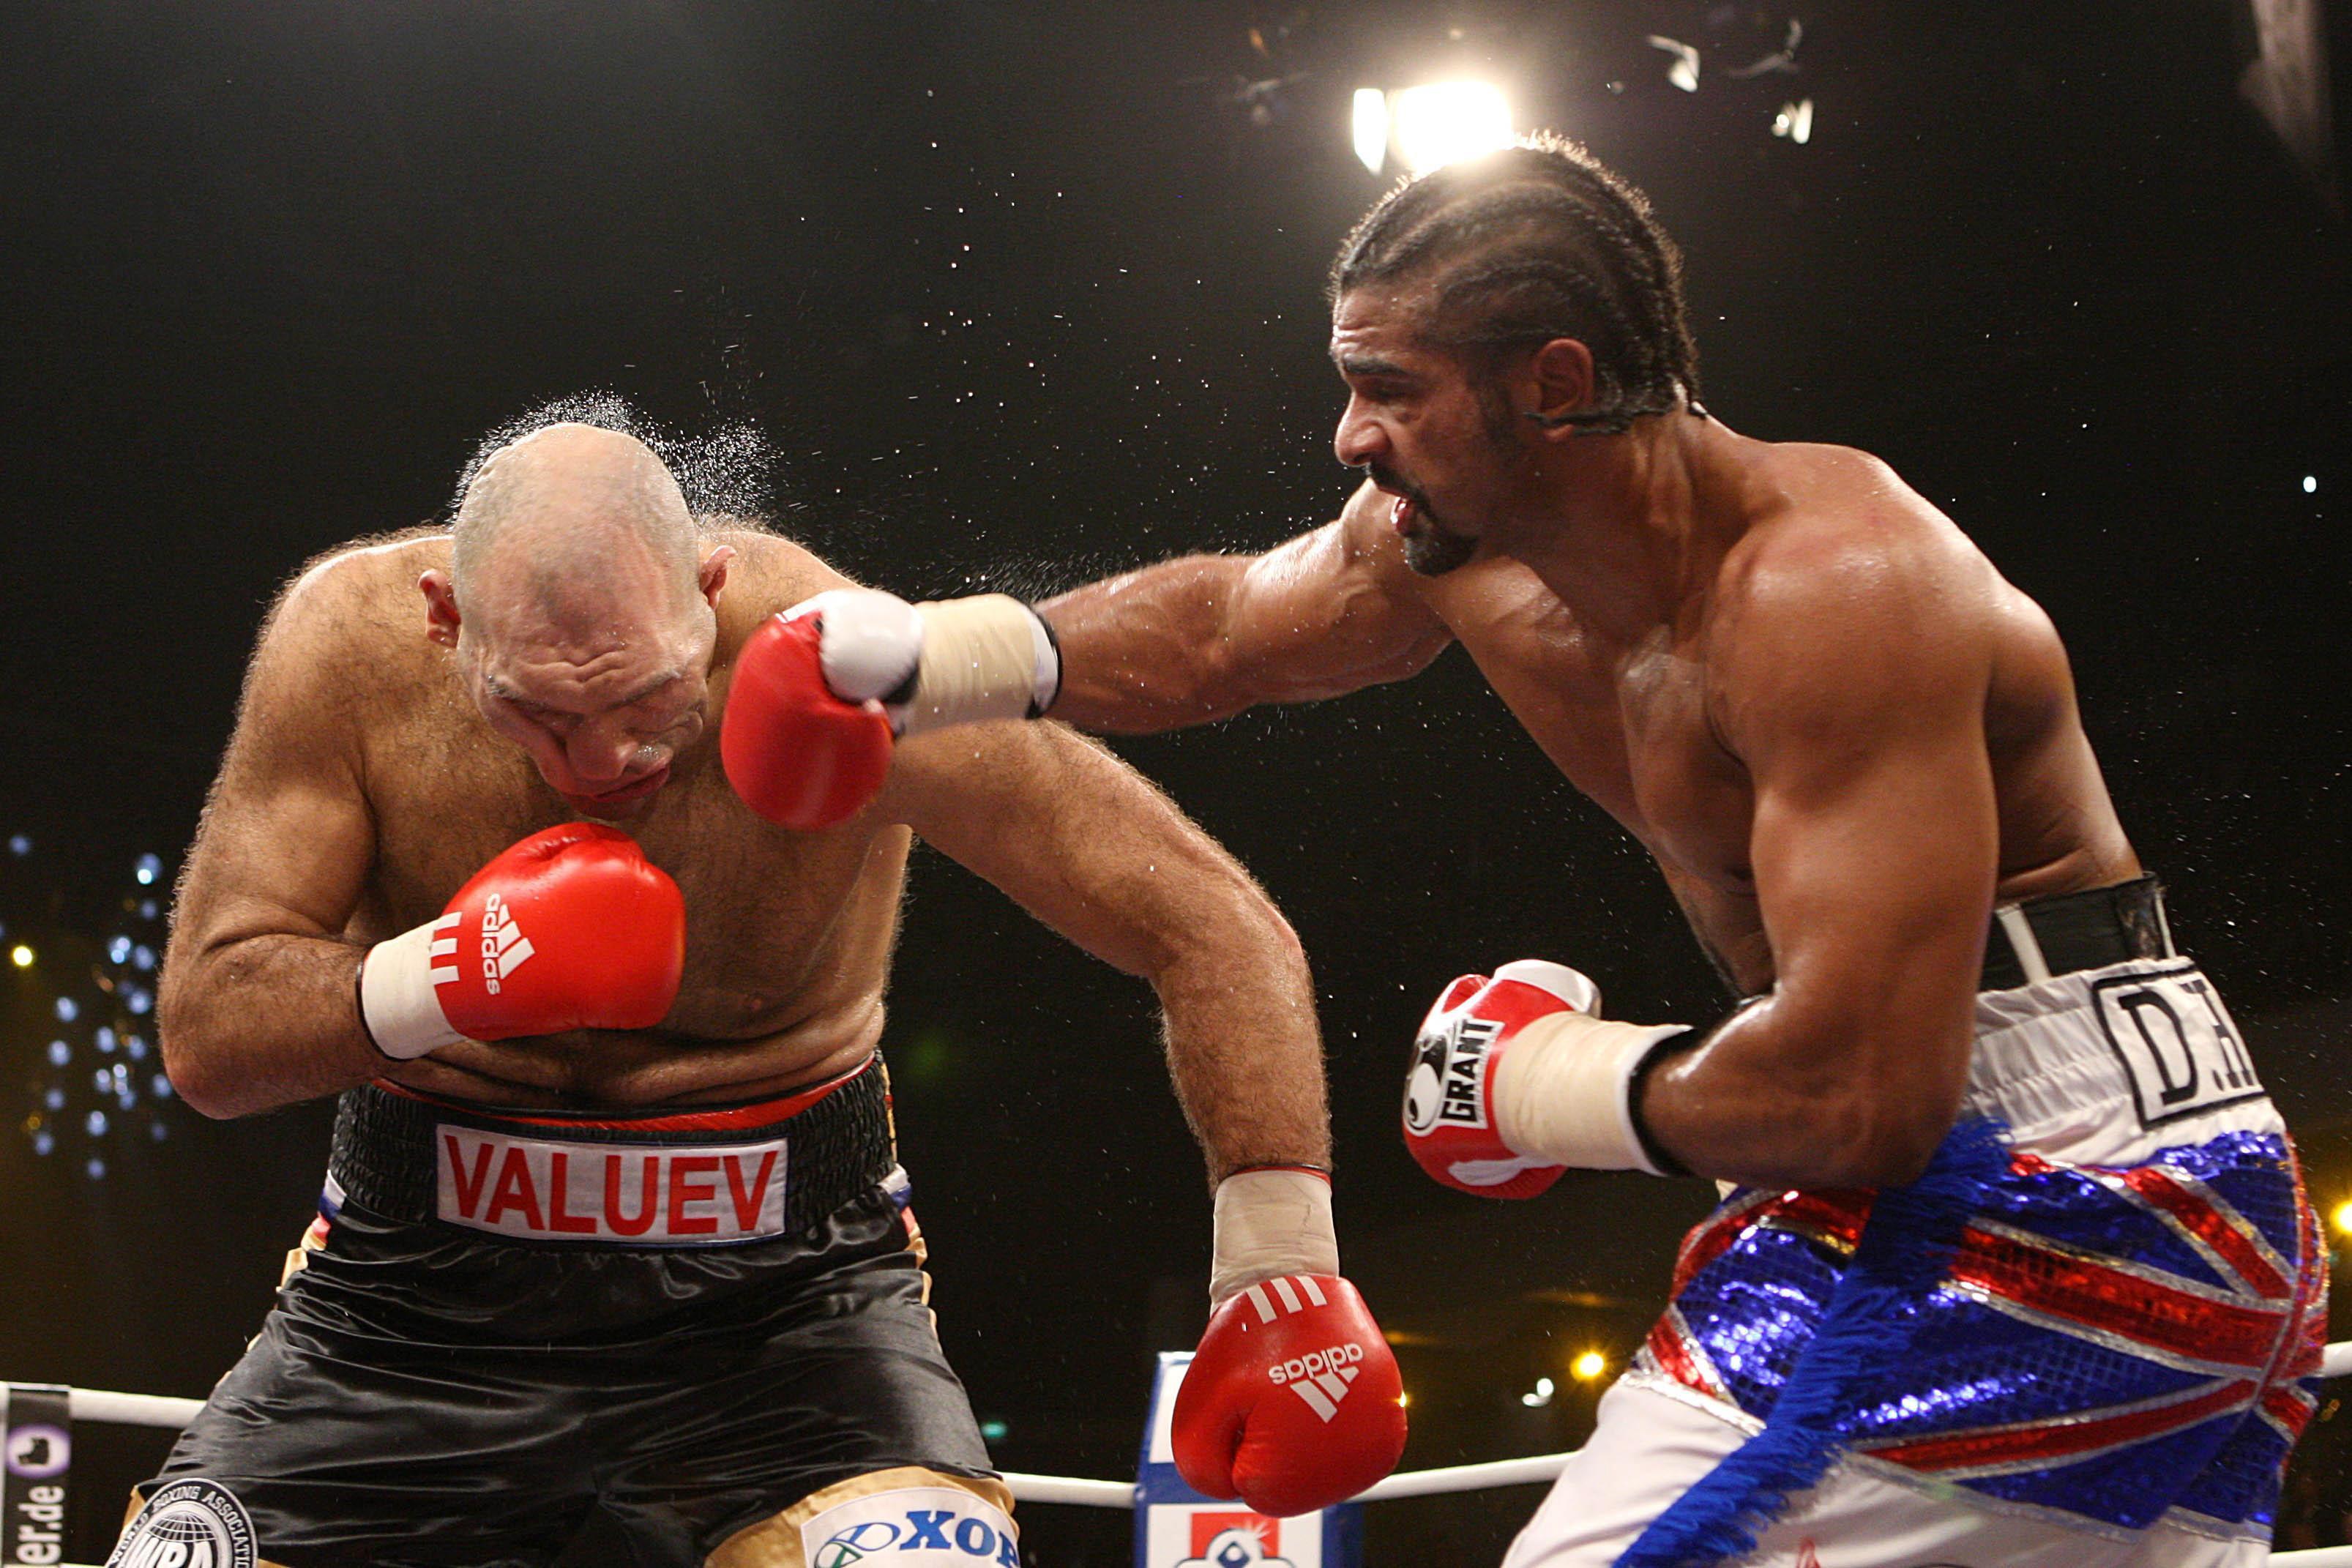 Haye beat Nikolay Valuev in Nuremberg in 2009 to become WBA heavyweight champion of the world